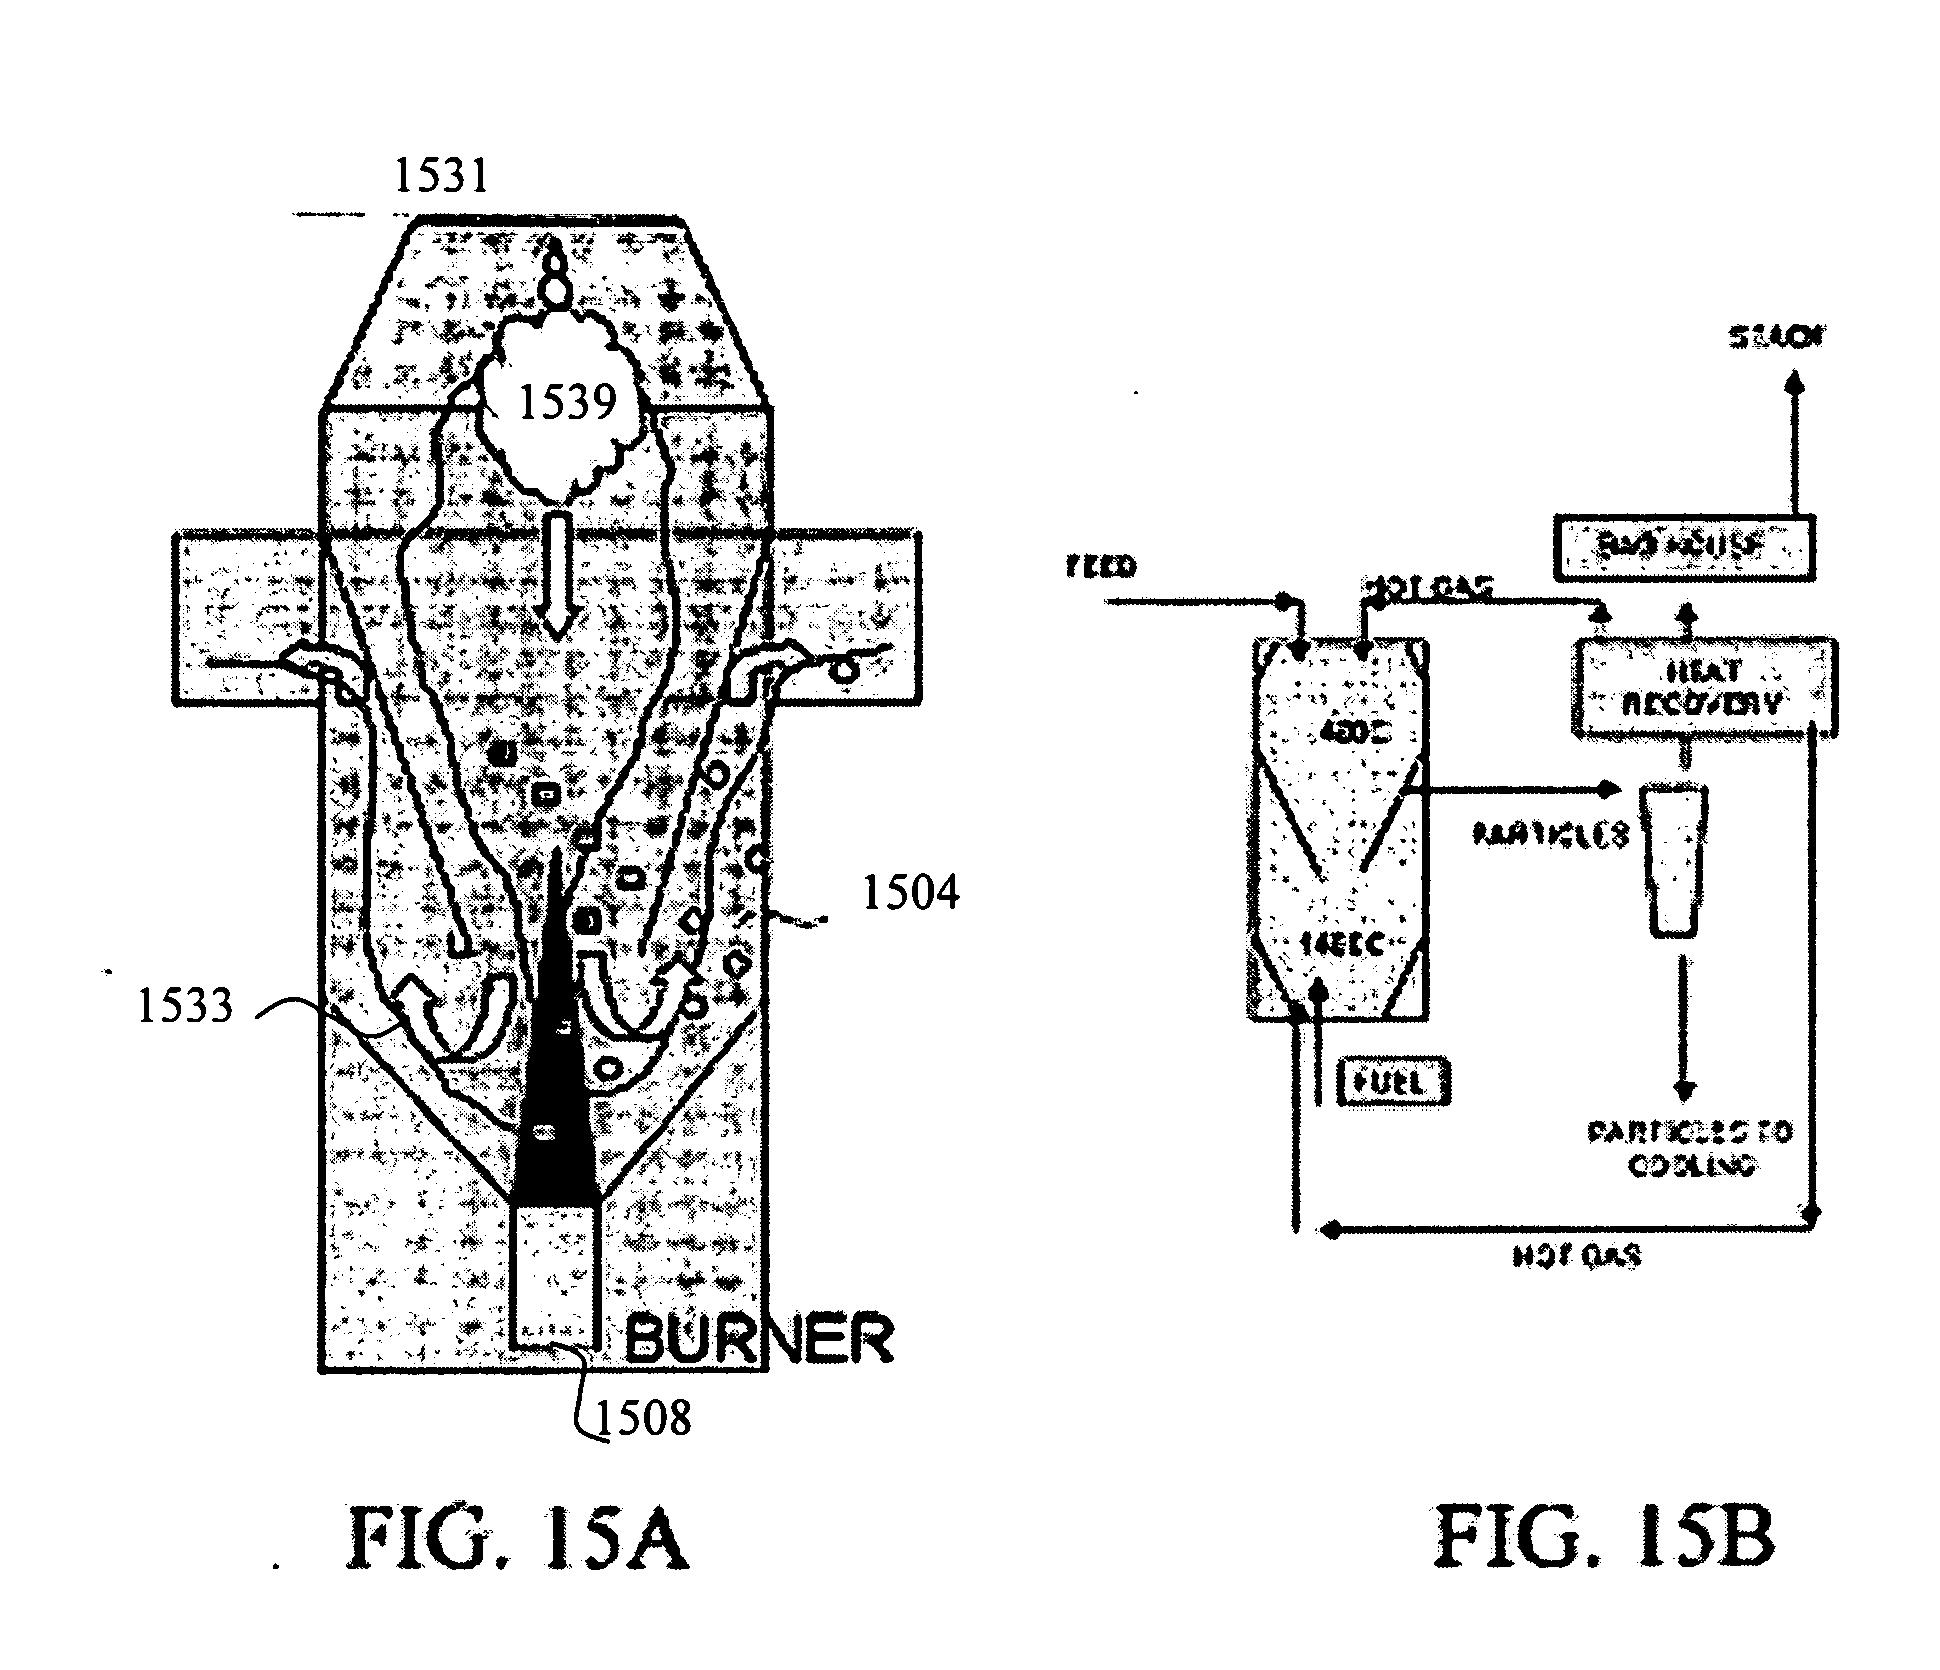 Wiring 911ep diagram td wl36rab wiring diagrams schematics 911ep wiring diagram wiring diagram cerwin vega wiring diagram denso alternator wiring diagram pdf obd0 911ep cheapraybanclubmaster Gallery